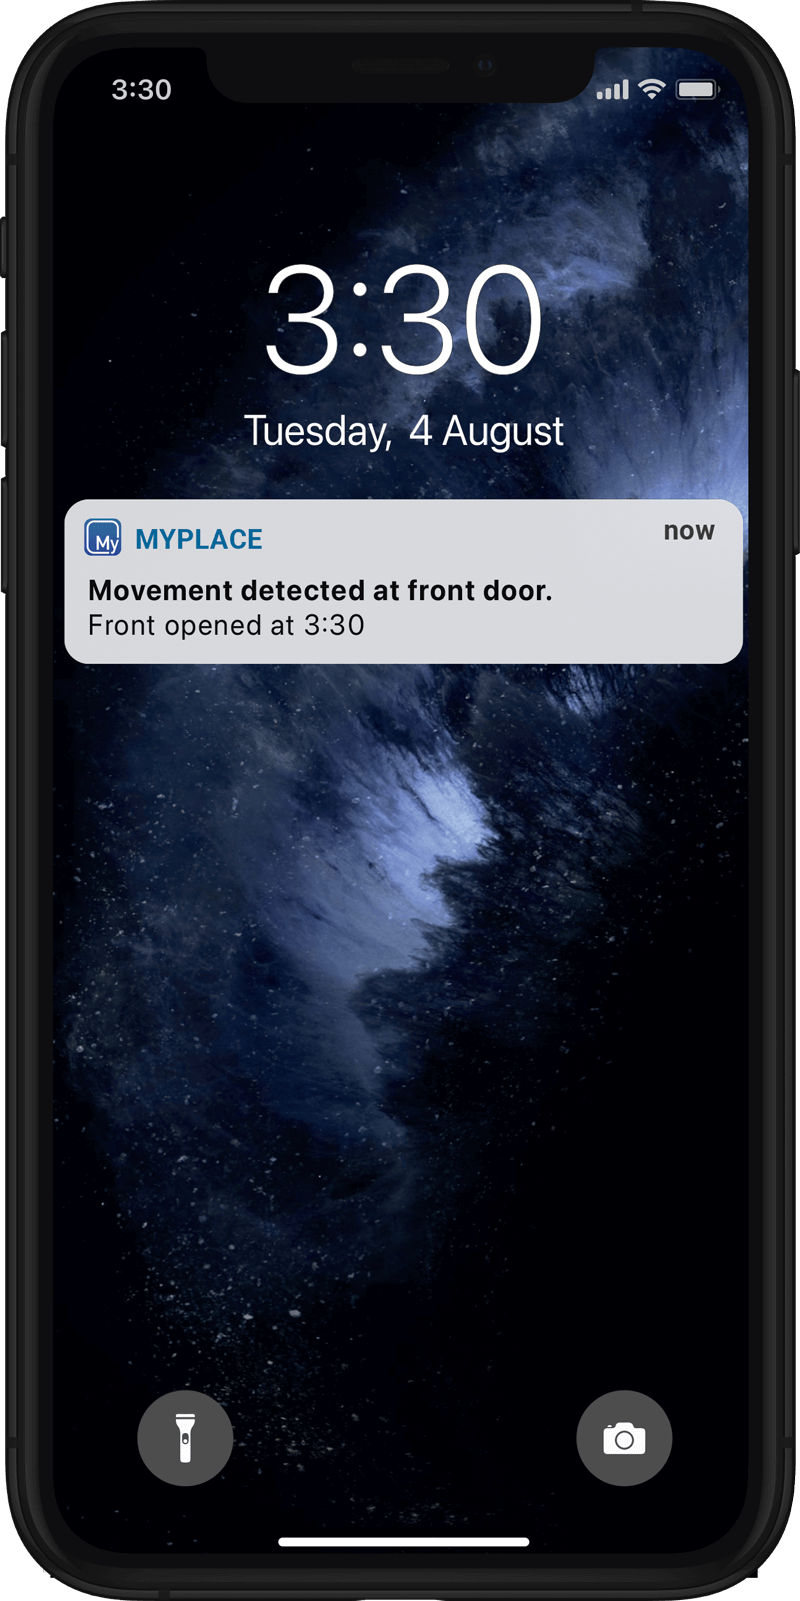 MyMonitor security alert on smart phone